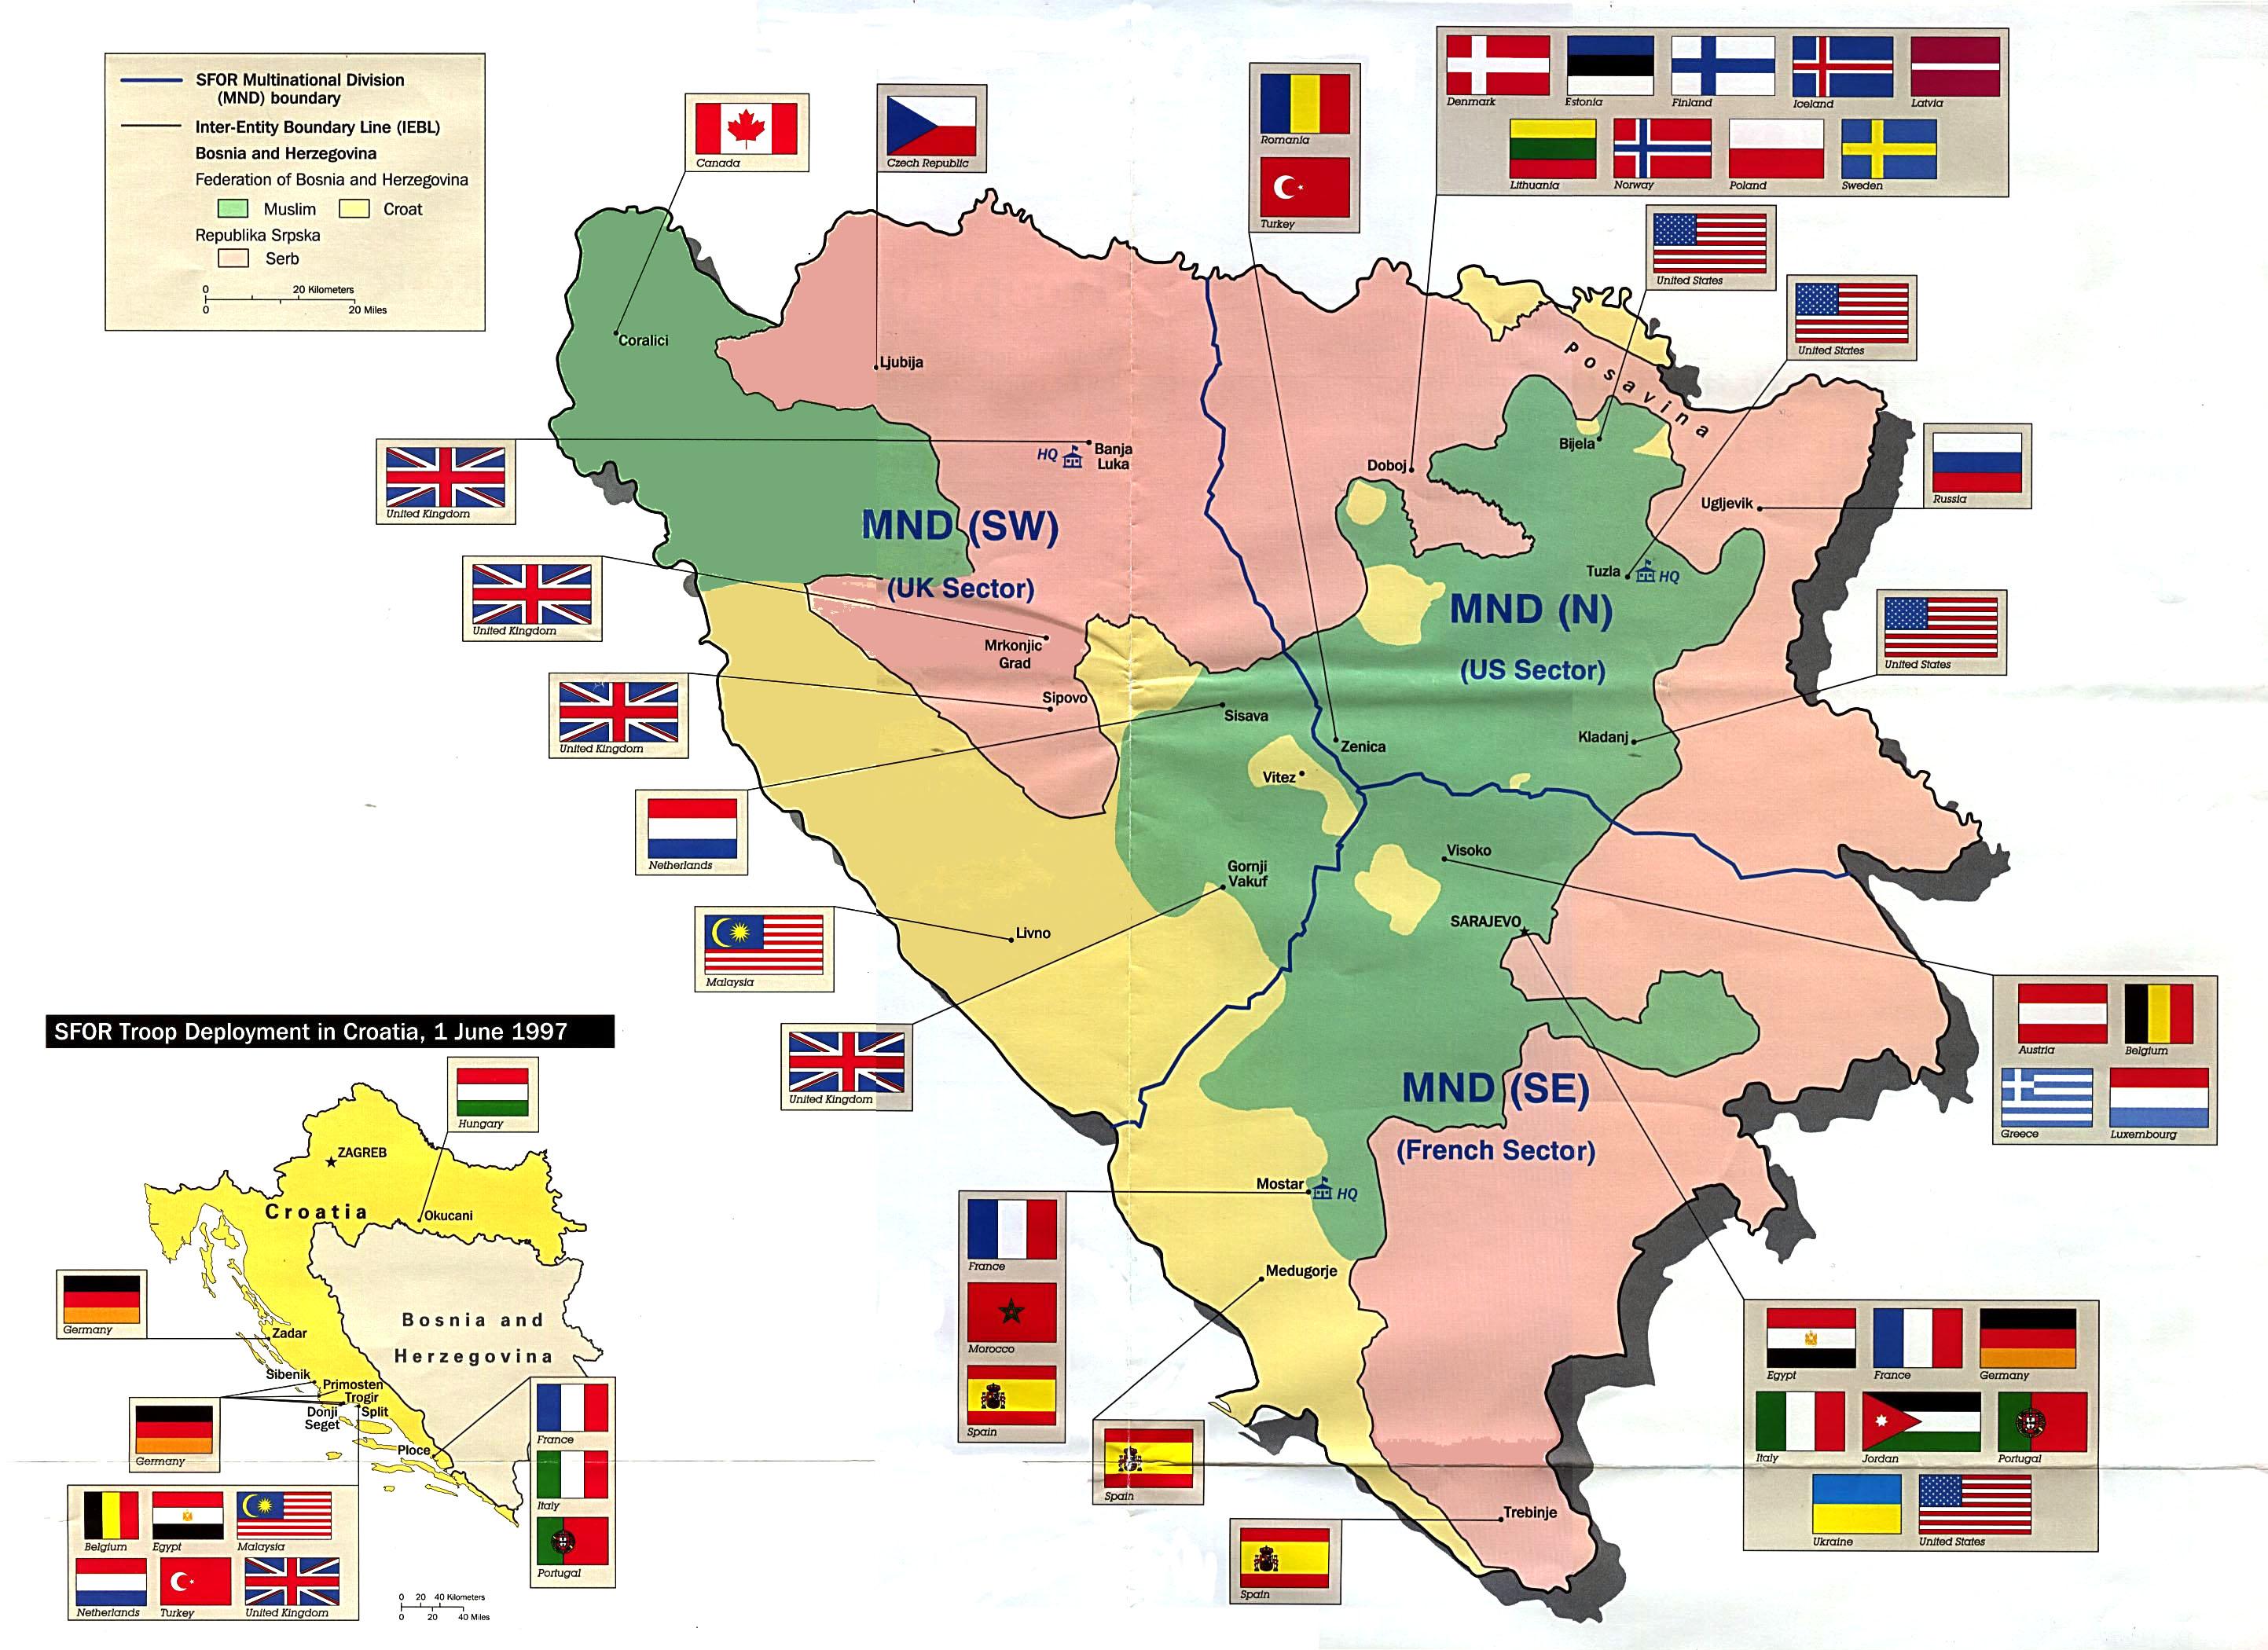 FileBosnia And Herzegovina Troop Deployment Map Jpg The - Bosnia and herzegovina map